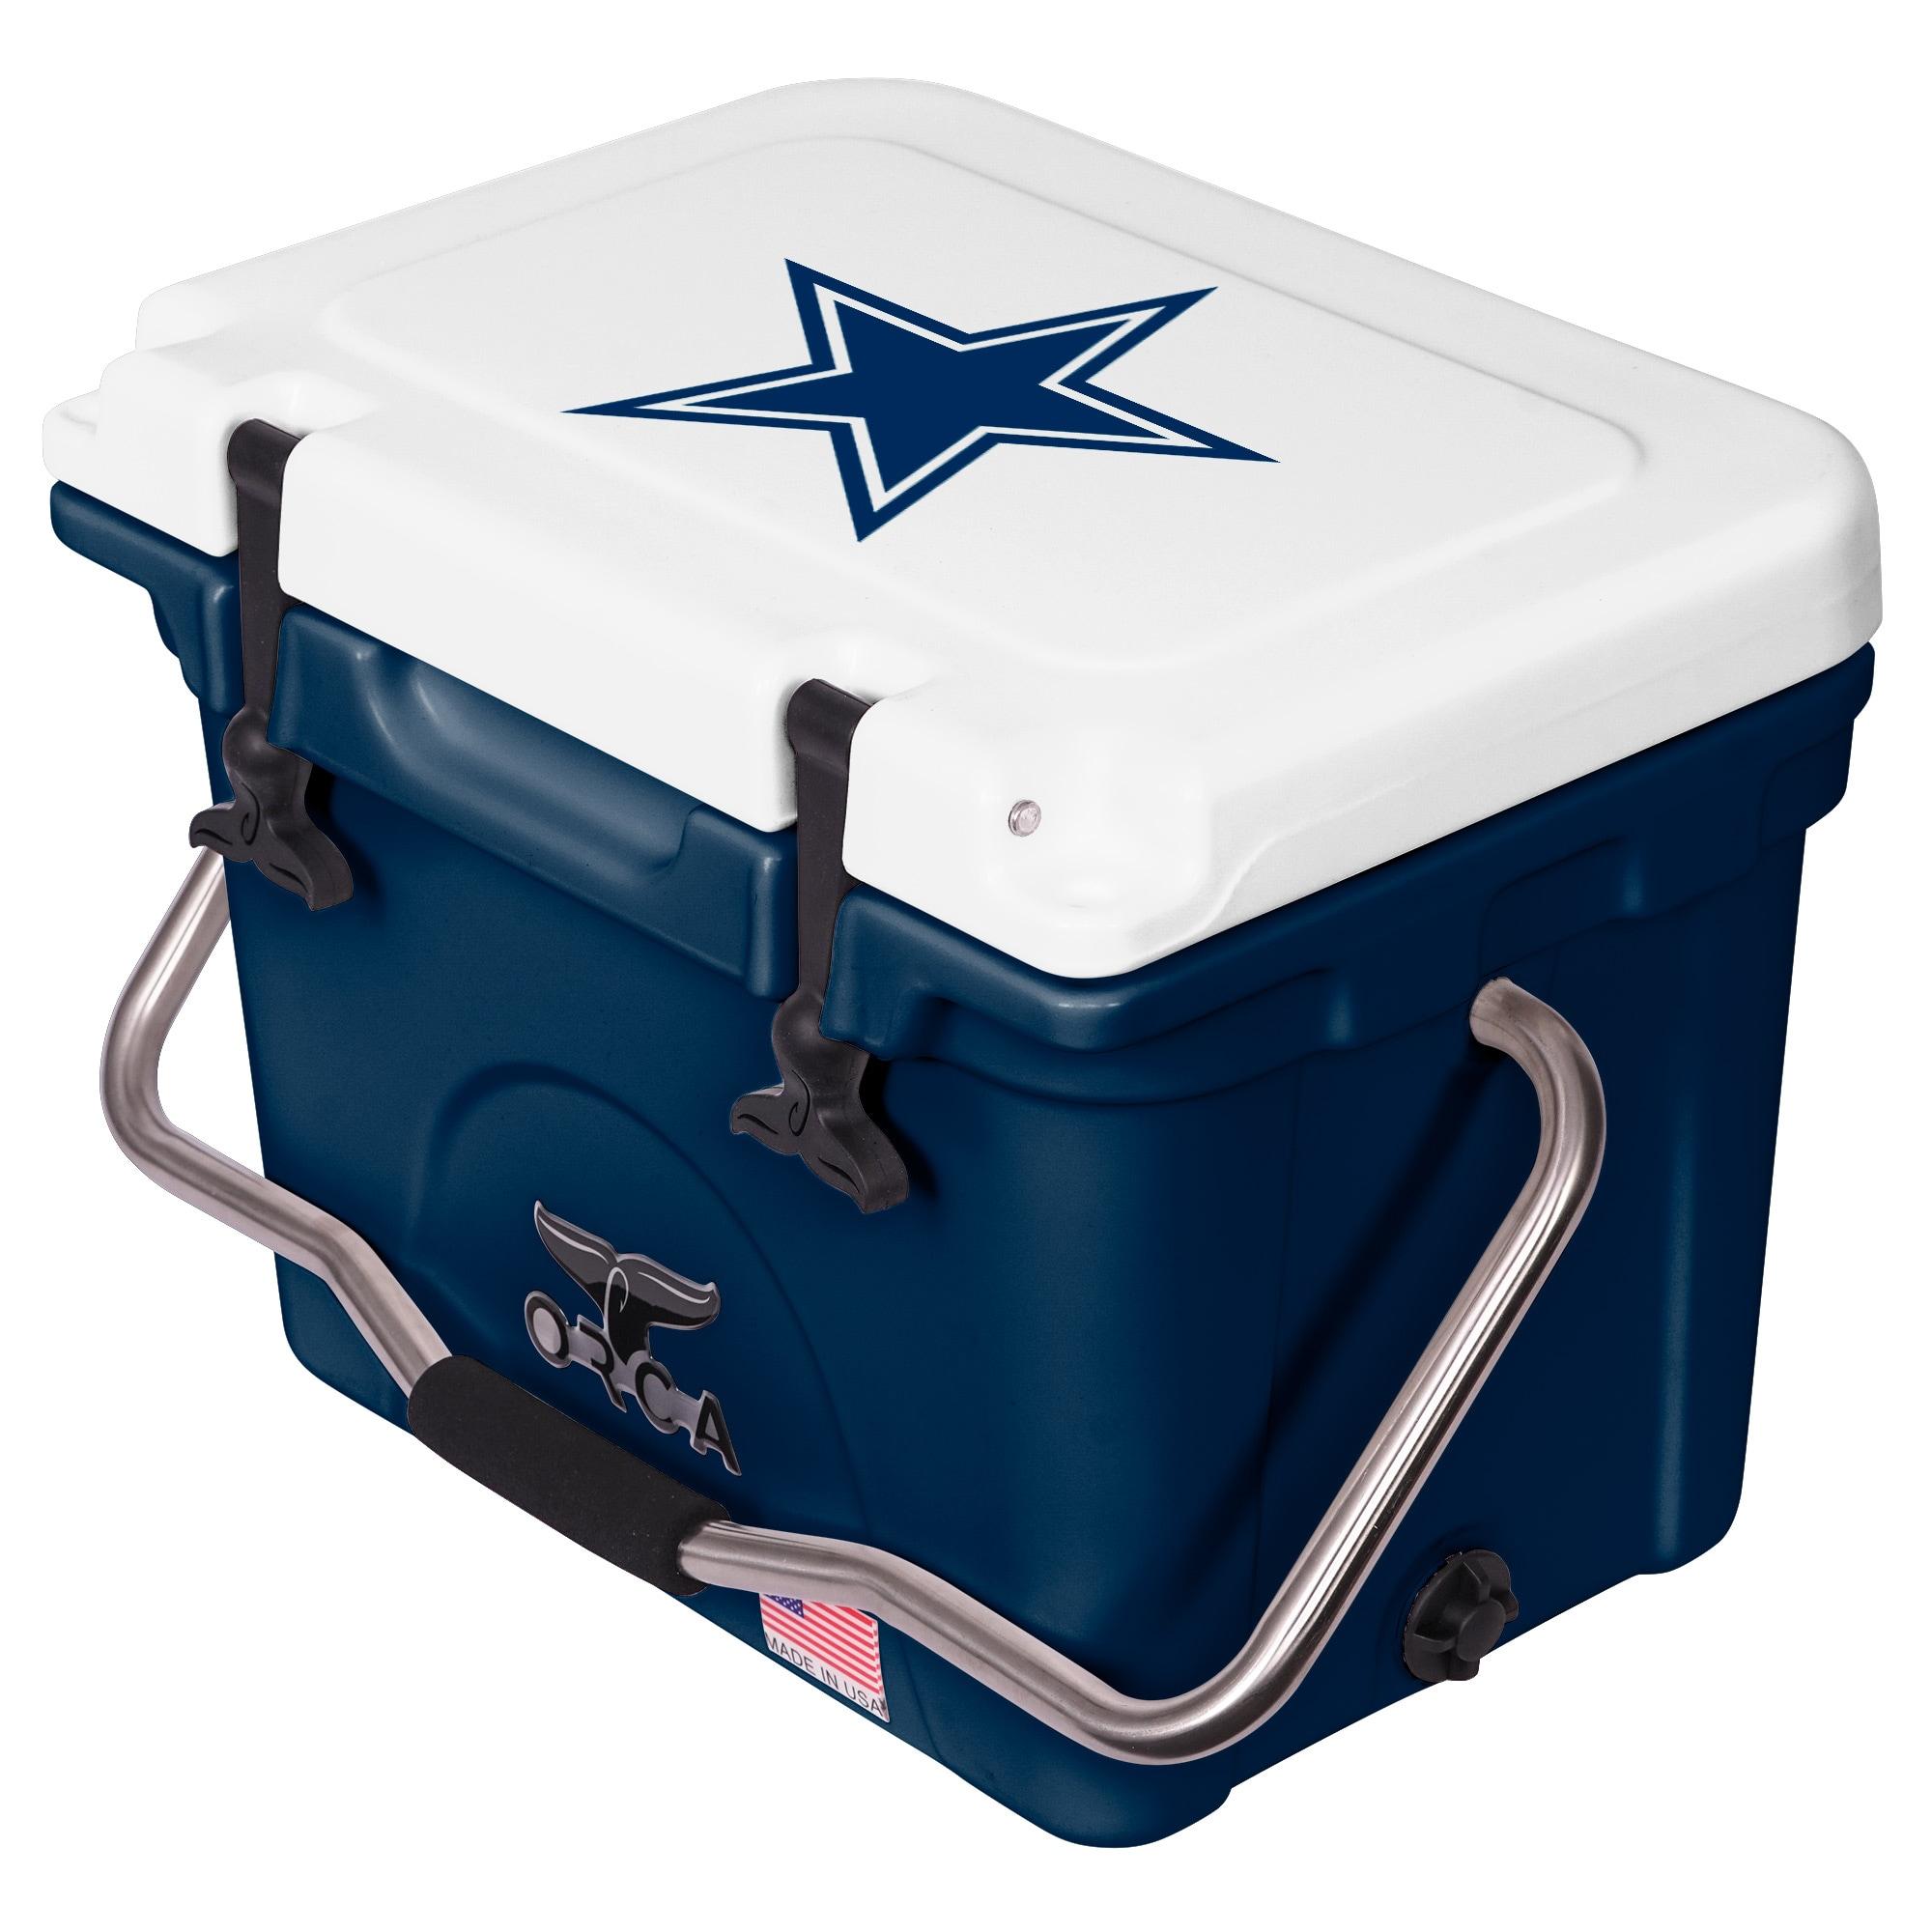 Dallas Cowboys ORCA 20-Quart Hard-Sided Cooler - White/Navy